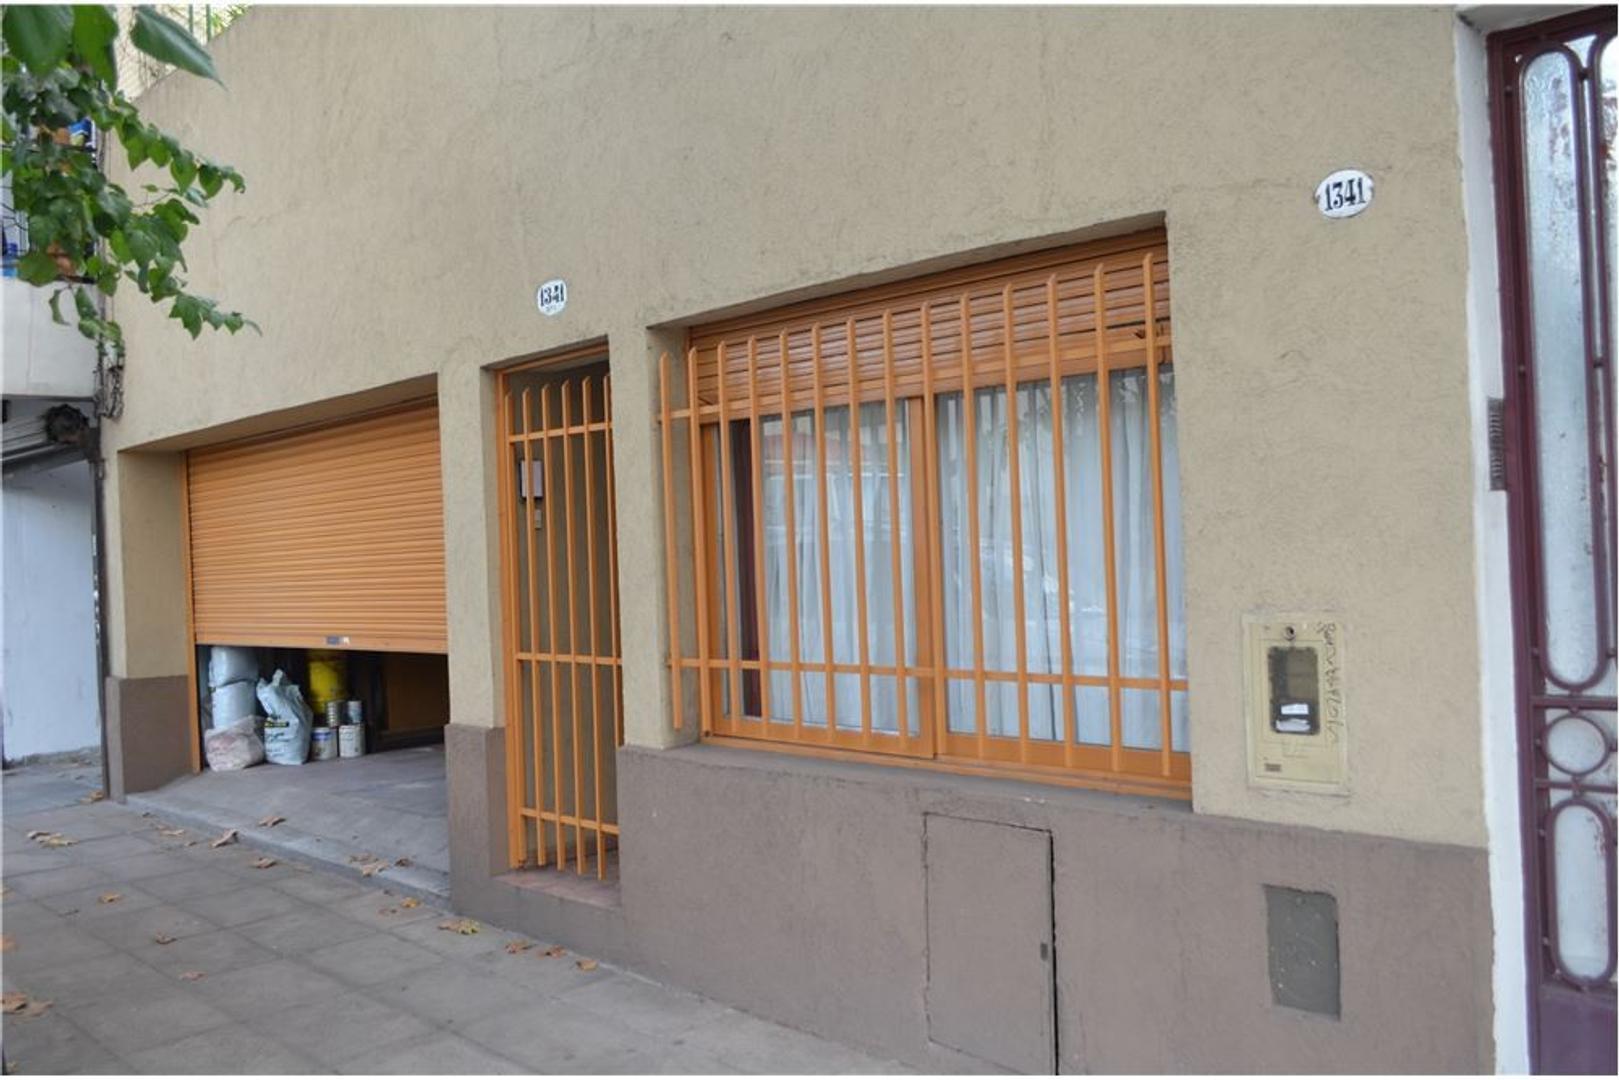 IMPECABLE PH al Frente, 180m2 + patio & terraza